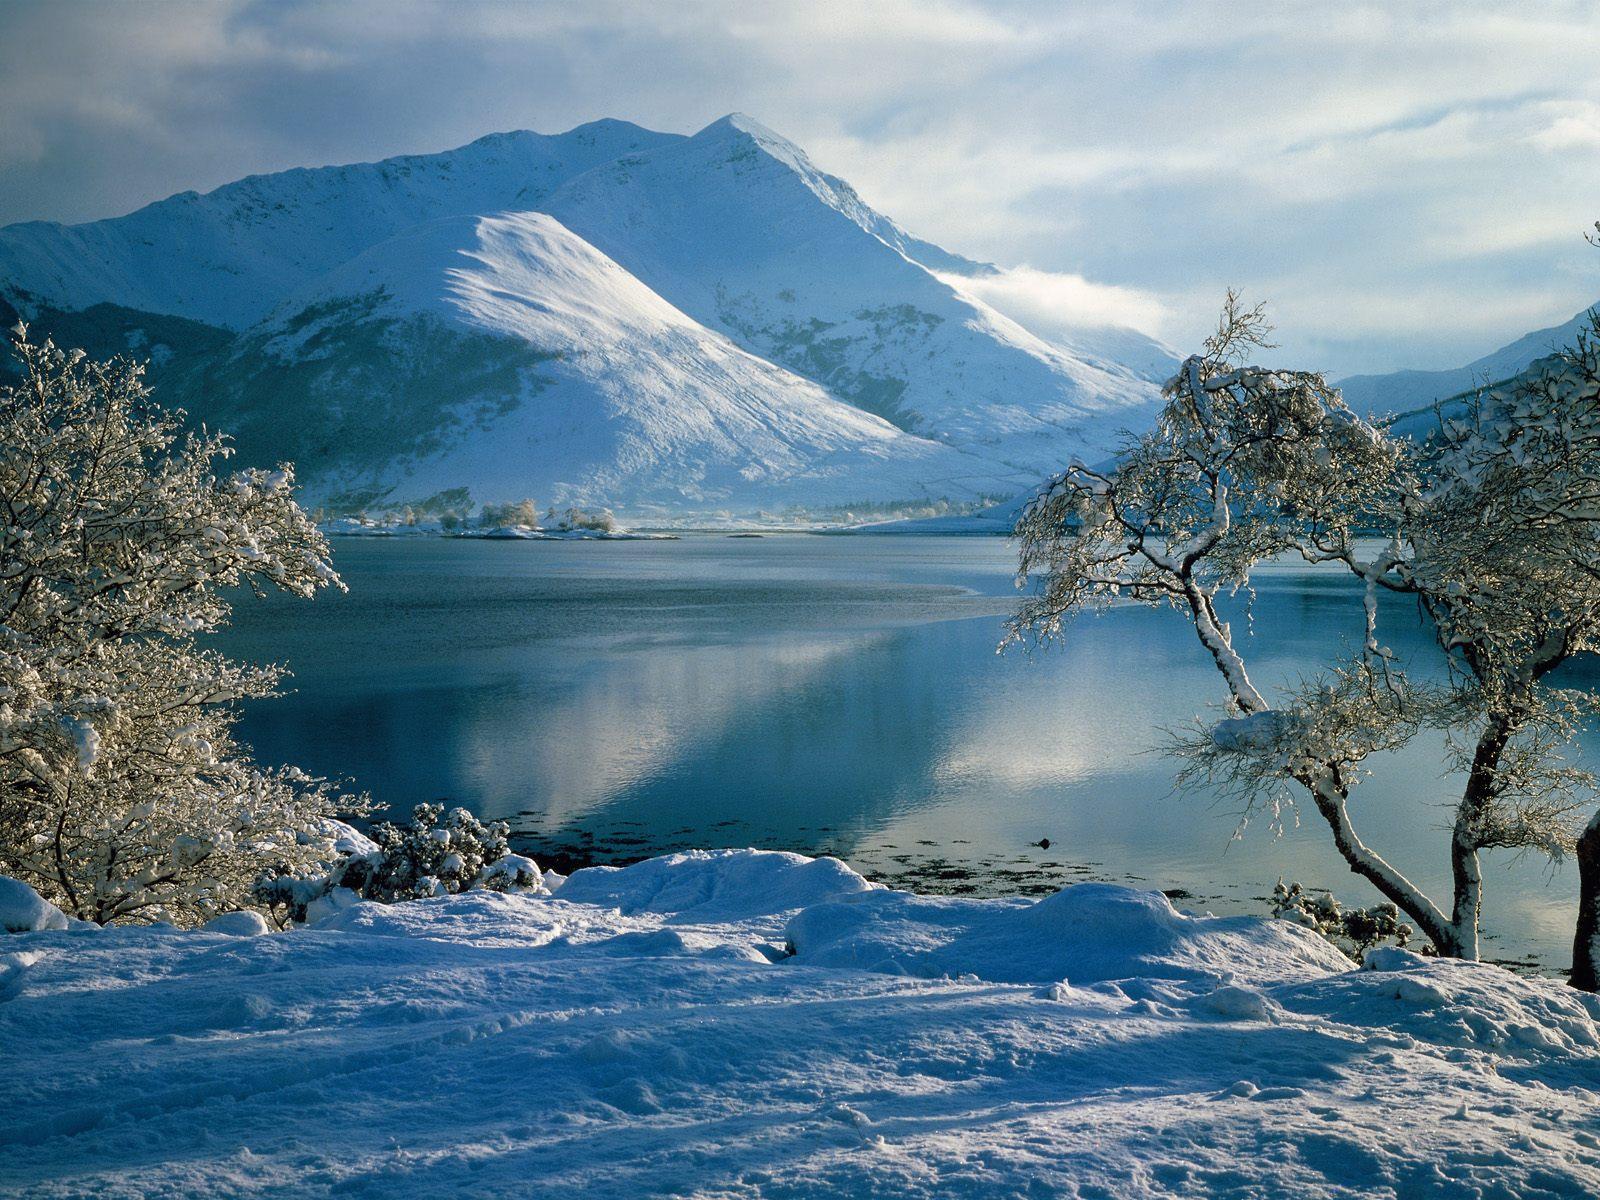 http://4.bp.blogspot.com/-E3YQZjfFhiI/Tk0u9JnKoKI/AAAAAAAABmw/Crgd9zemww4/s1600/Ballachulish%2C_Western_Highlands_Scotland.jpg